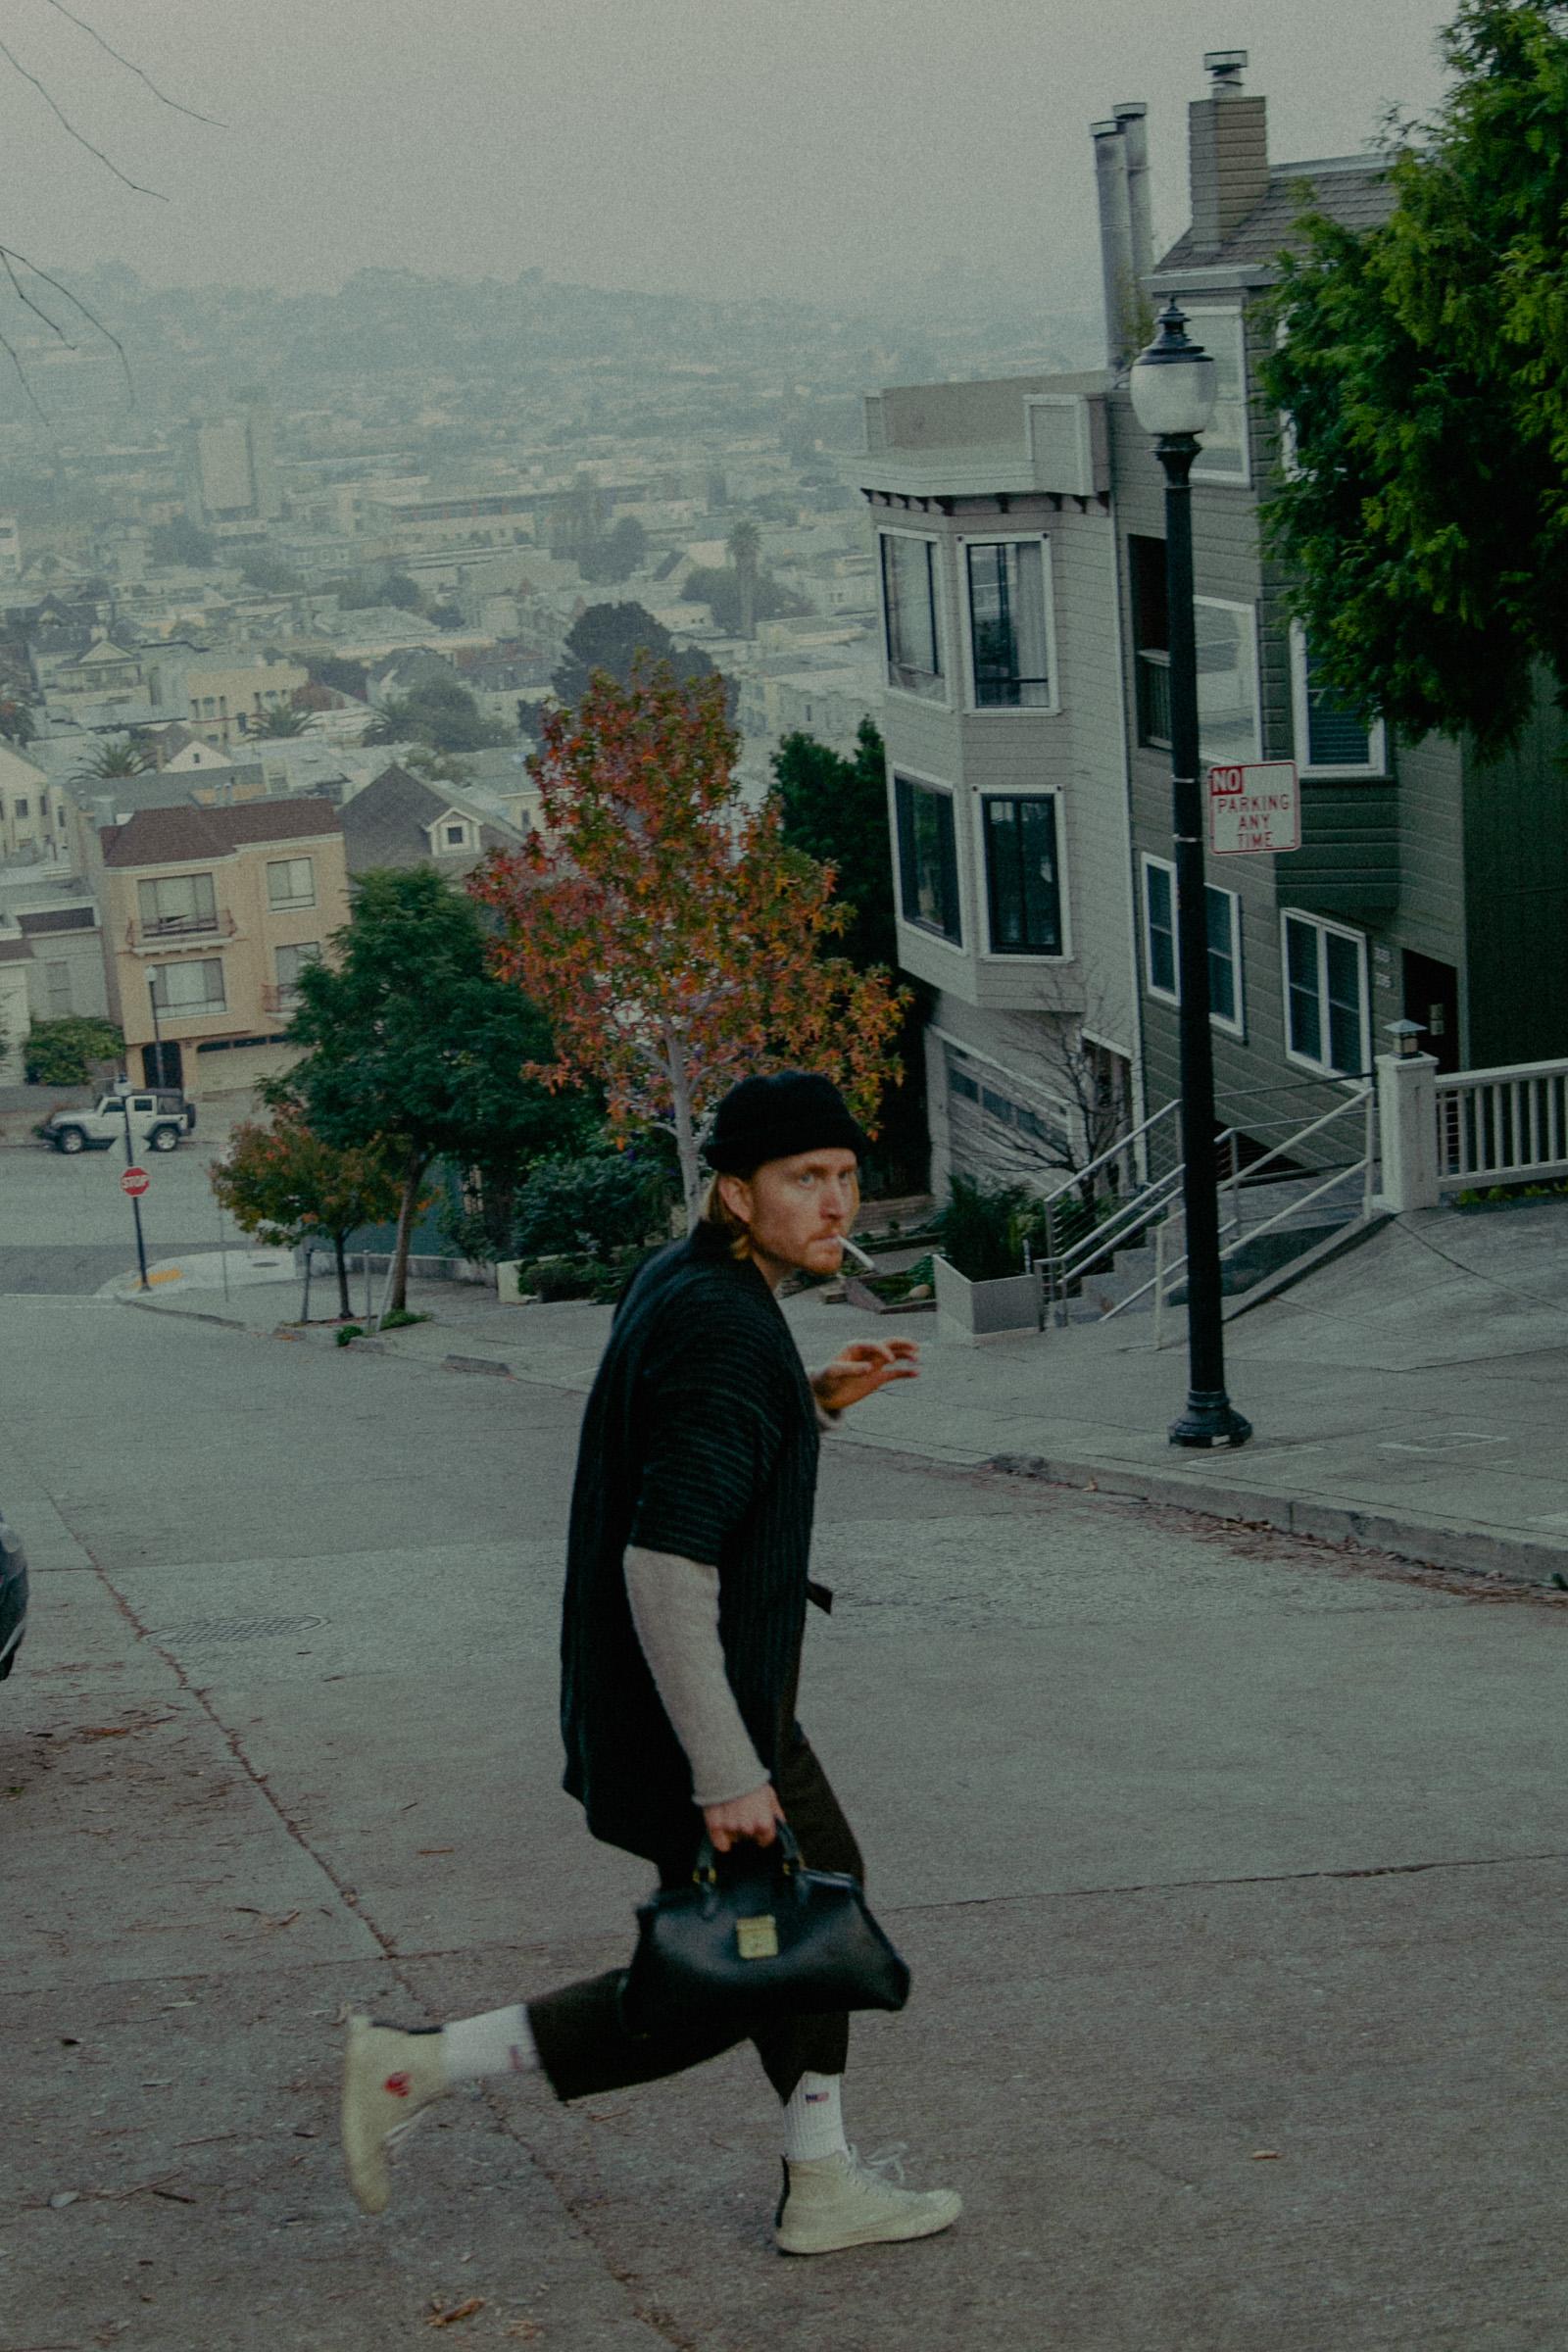 San-Francisco-web-11.jpg